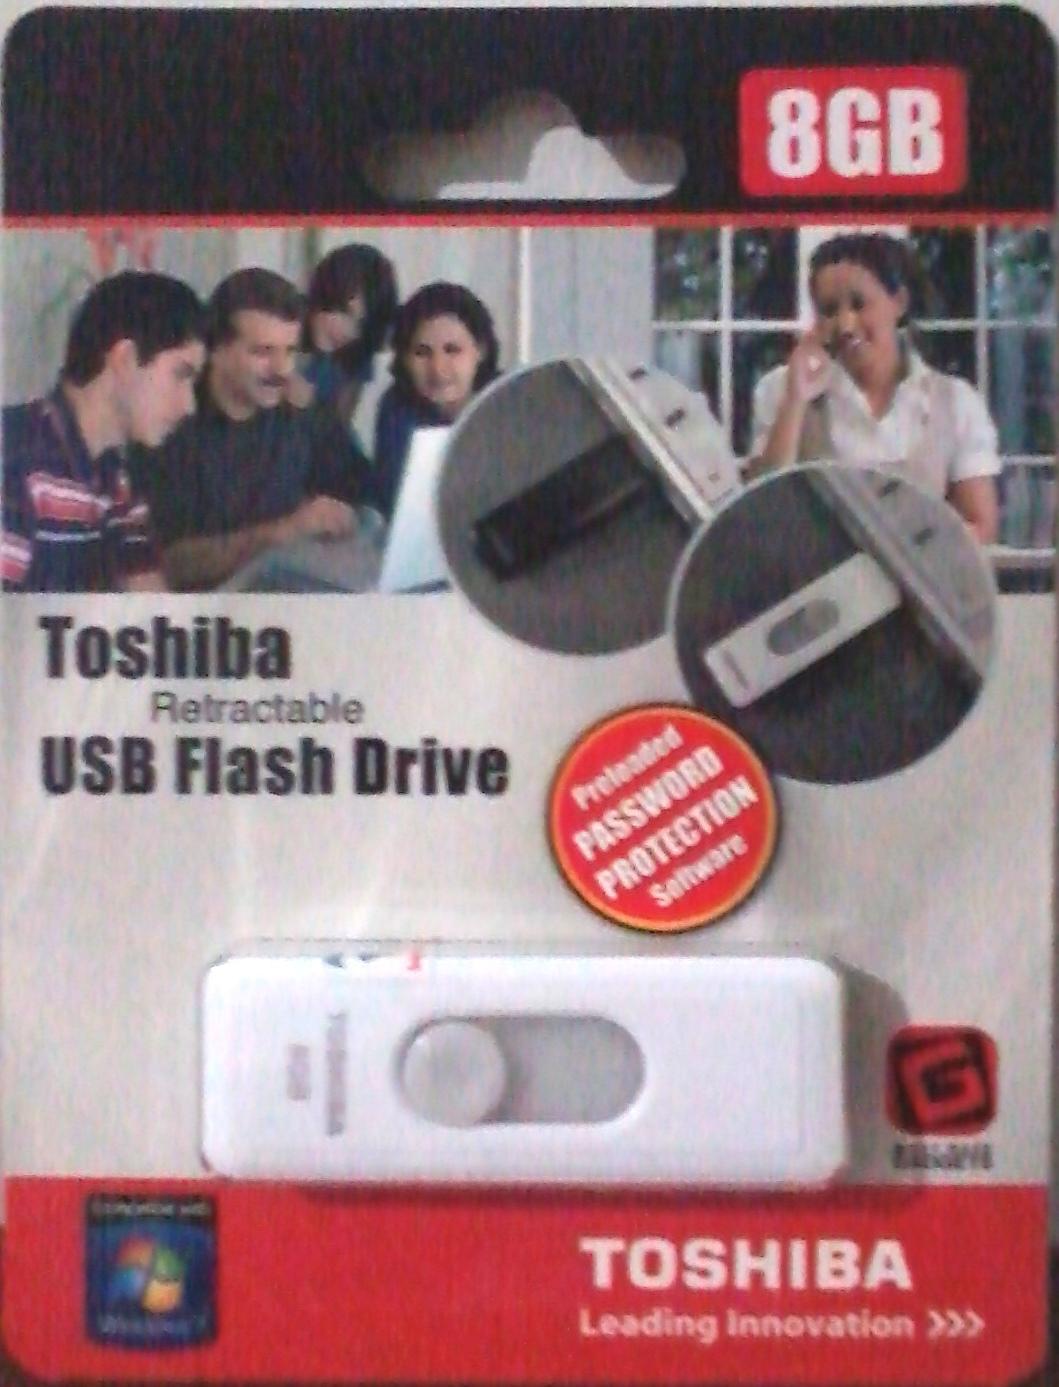 Jual Toshiba 8gb Flasdisk 8 Gb Flash Disk Usb Flashdisk Portal Community Agustus 2012 Adata Rp 60000